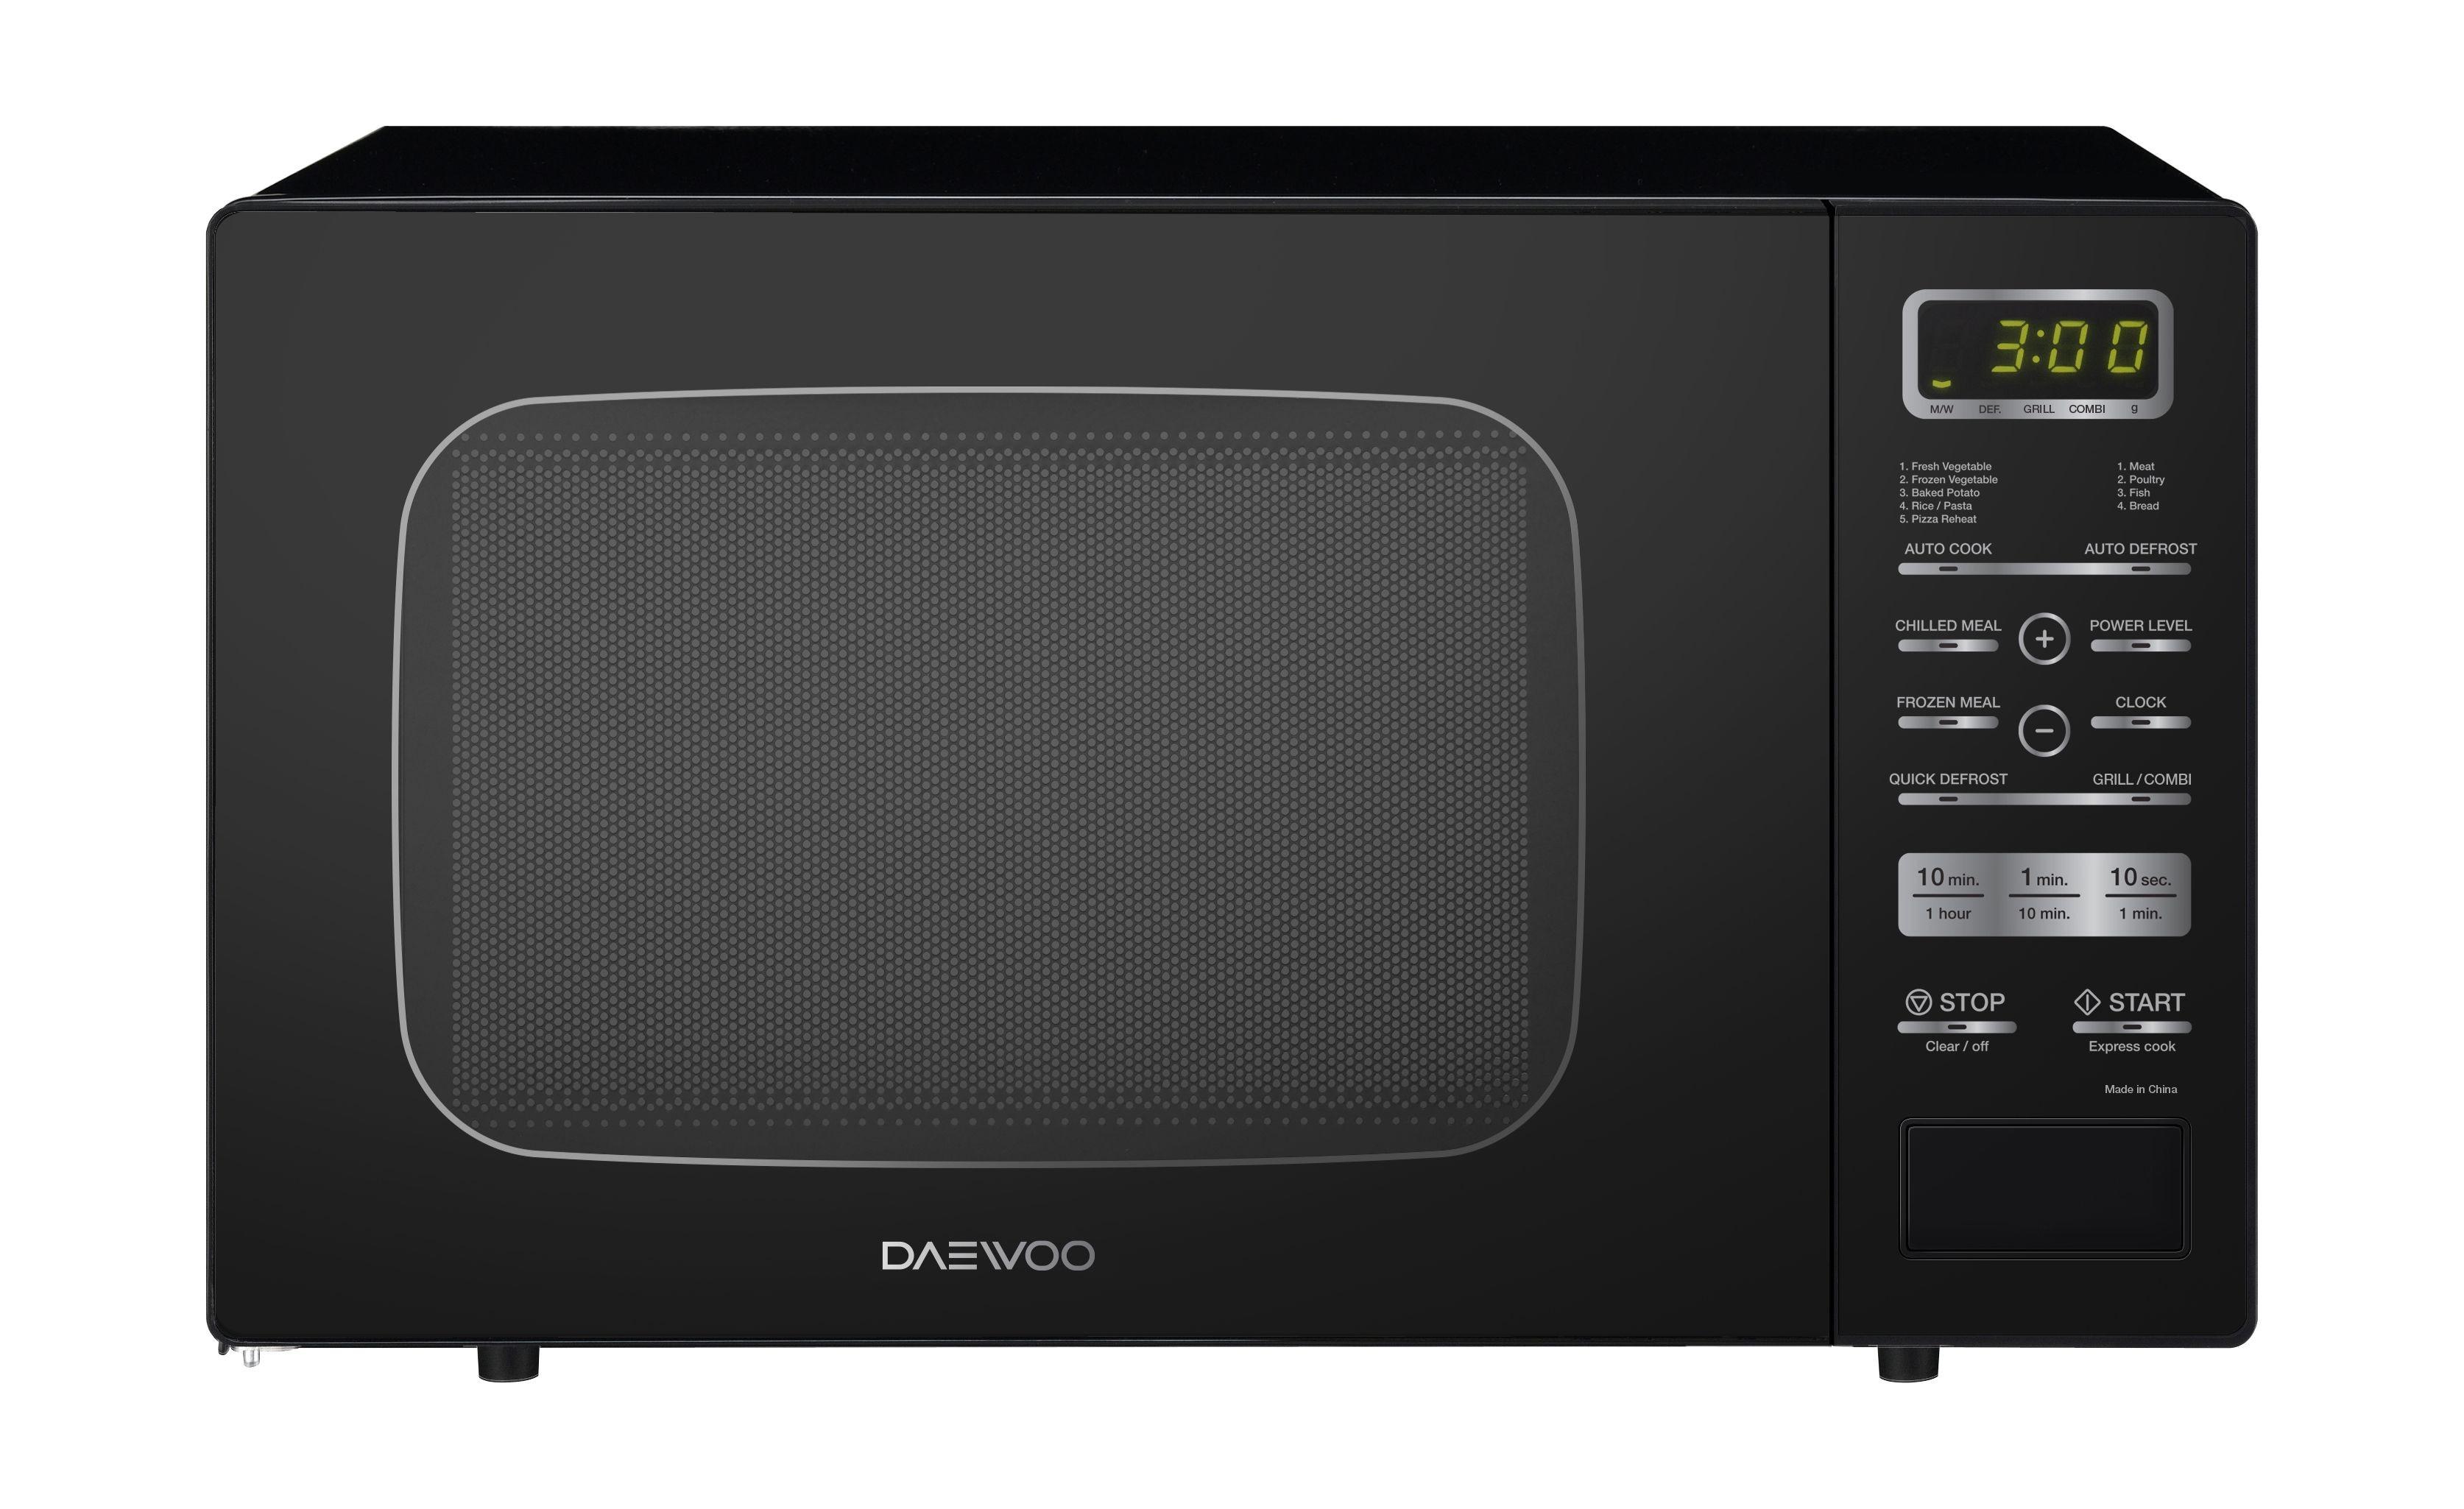 Daewoo 26L 900W Grill Microwave (KQG-9GPBB) – Black | Xcite Alghanim